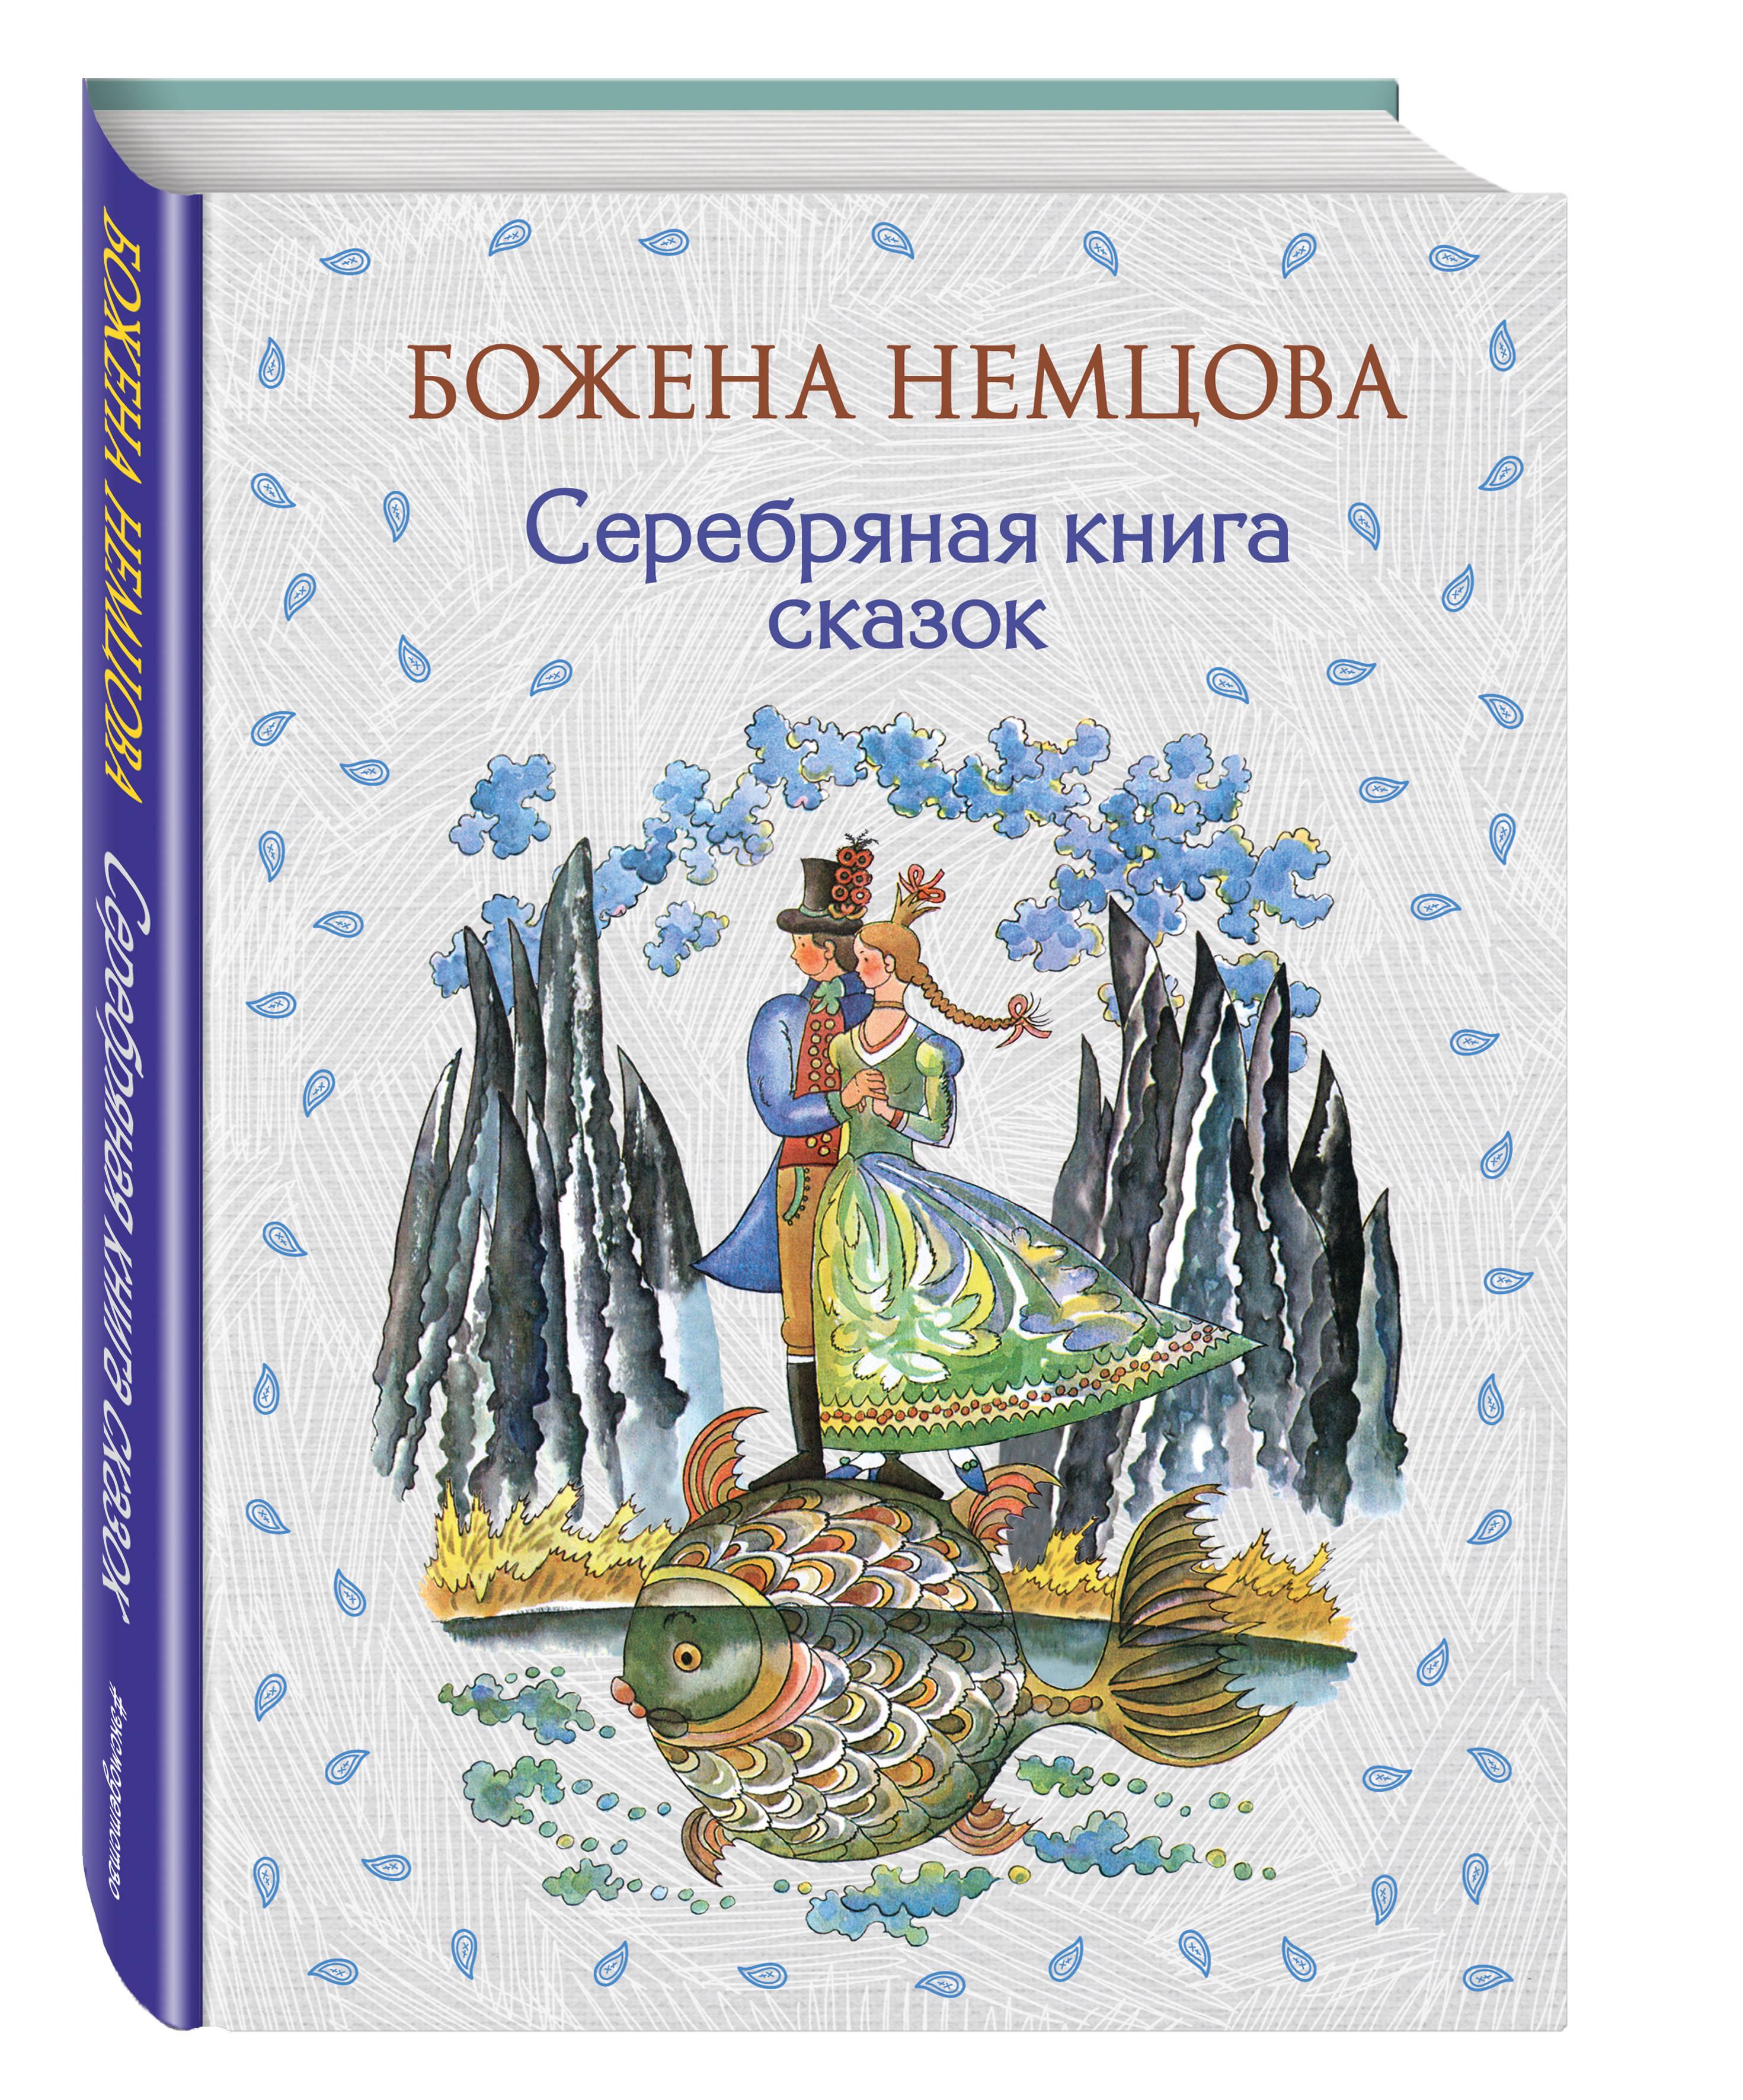 Божена Немцова Серебряная книга сказок ночь сказок 2018 11 10t18 00